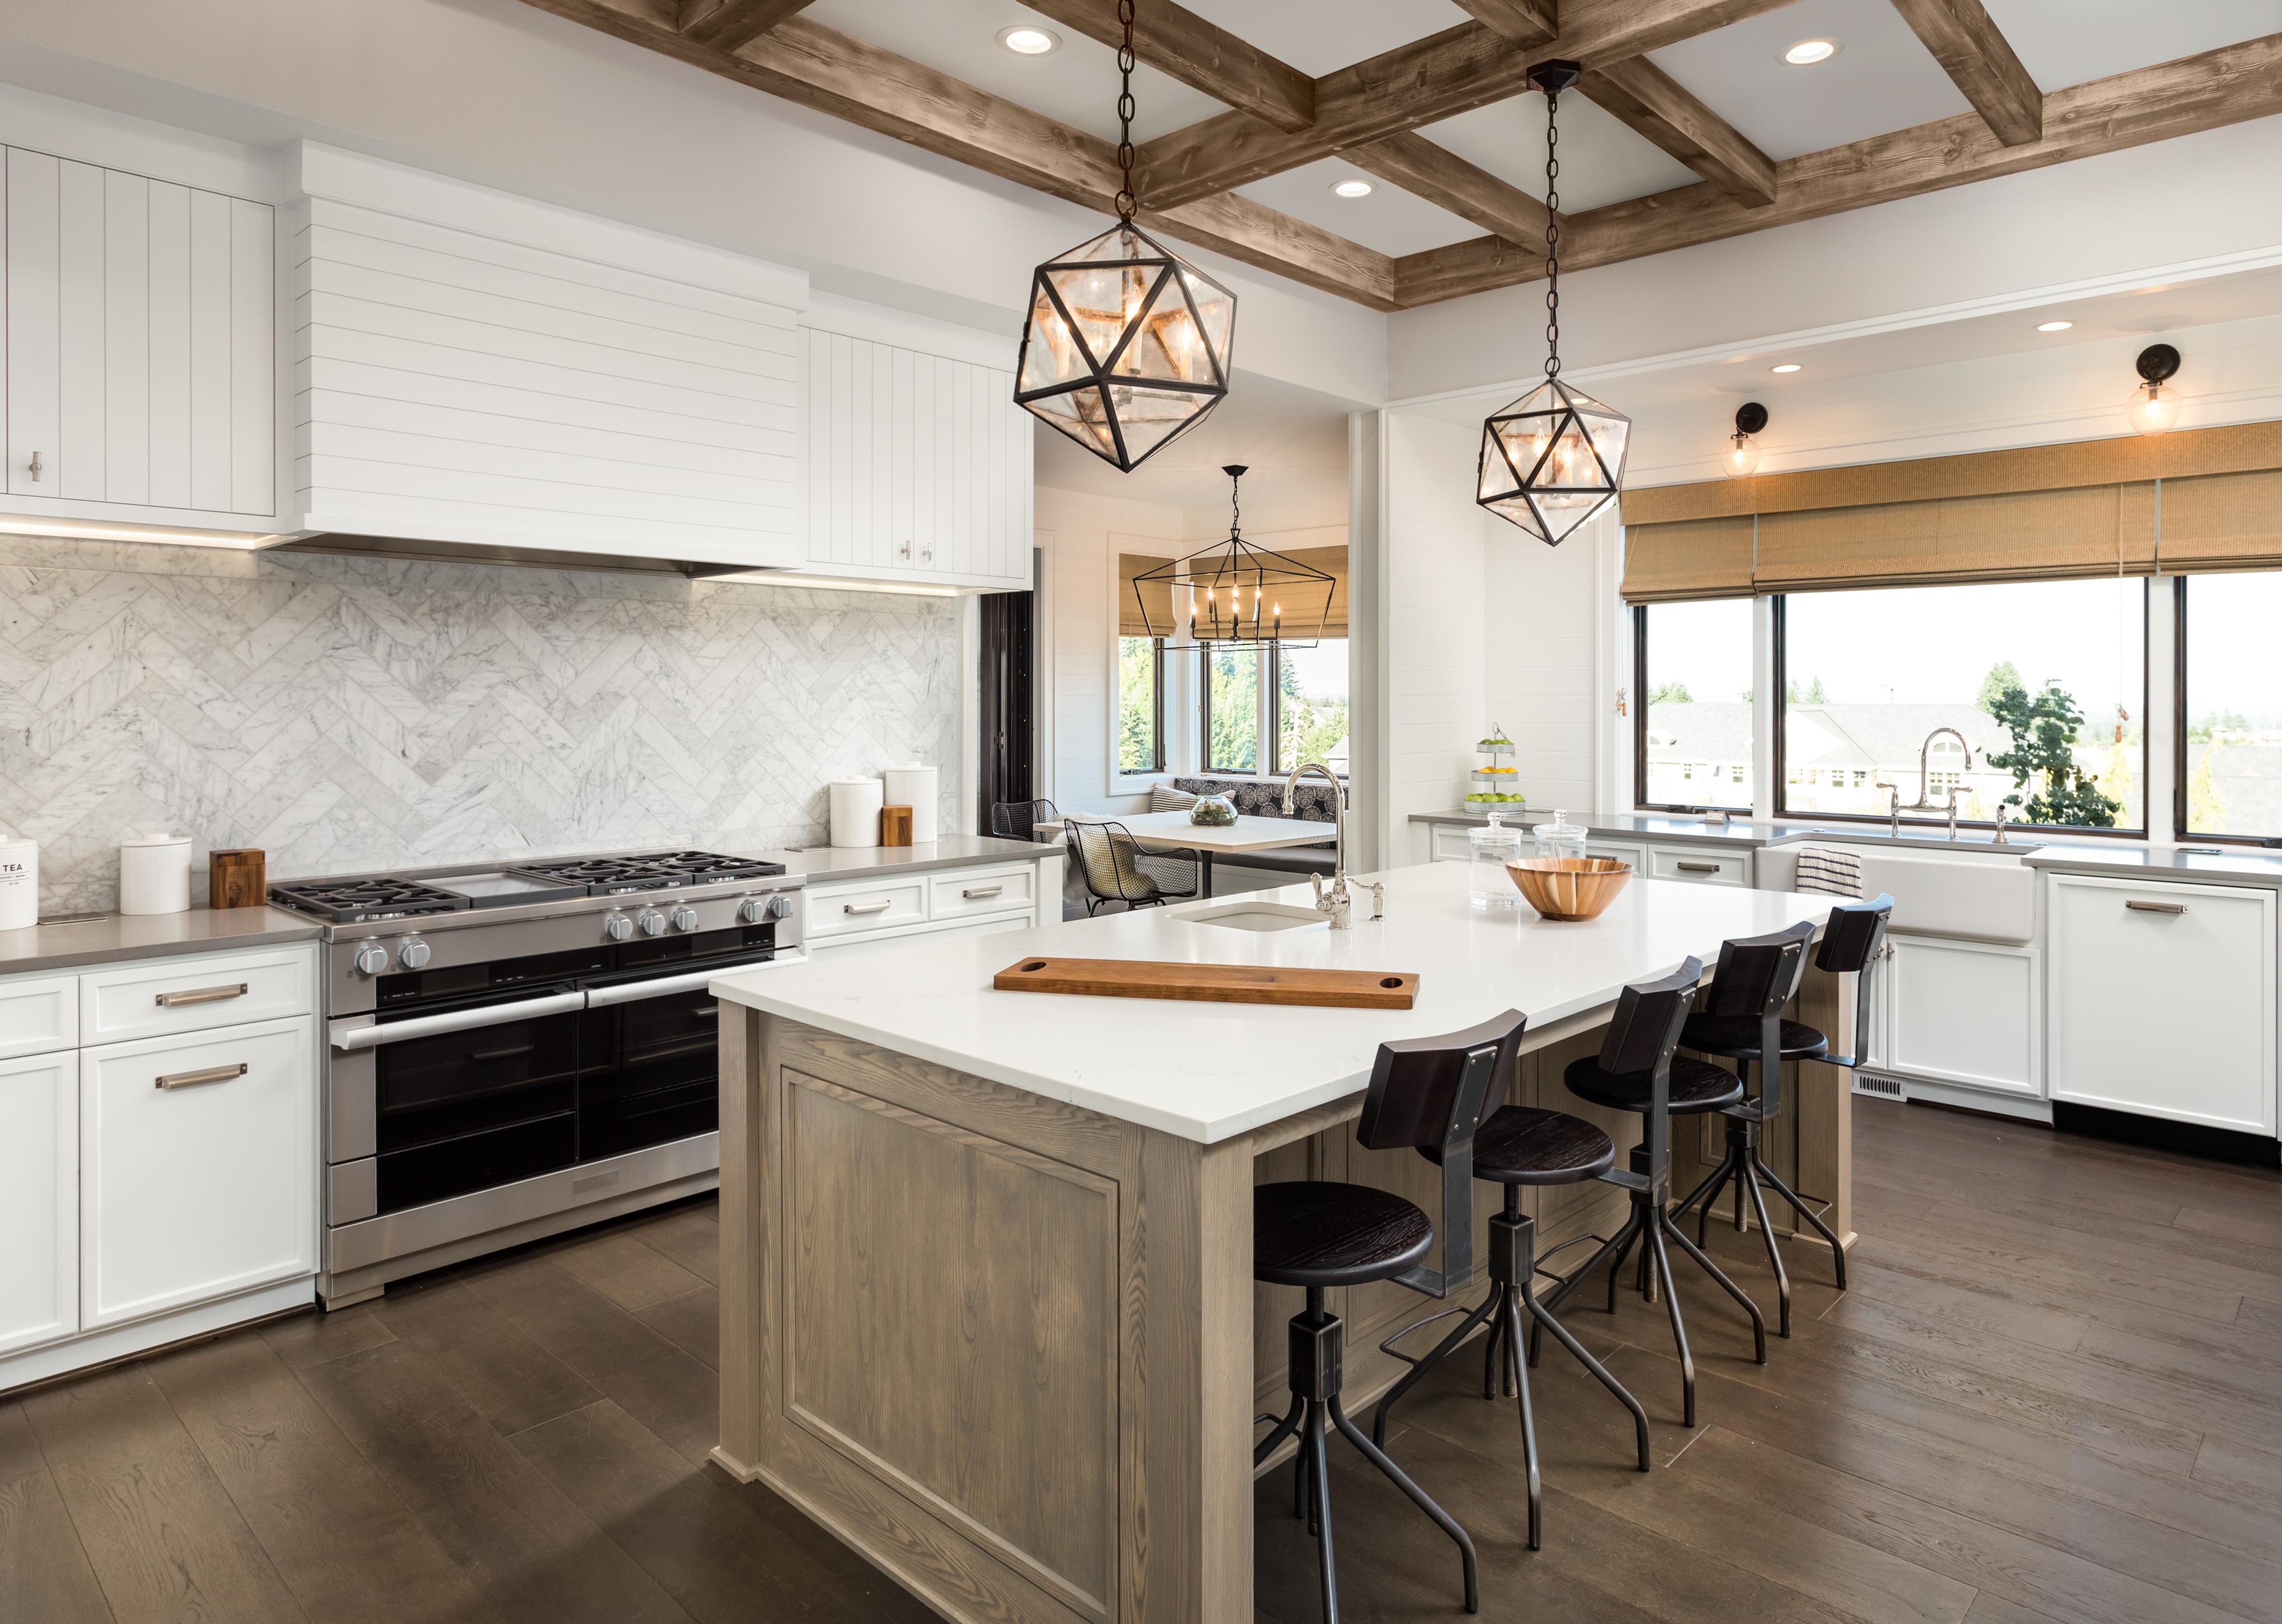 NAHB Housing Trends: Kitchen and Bath